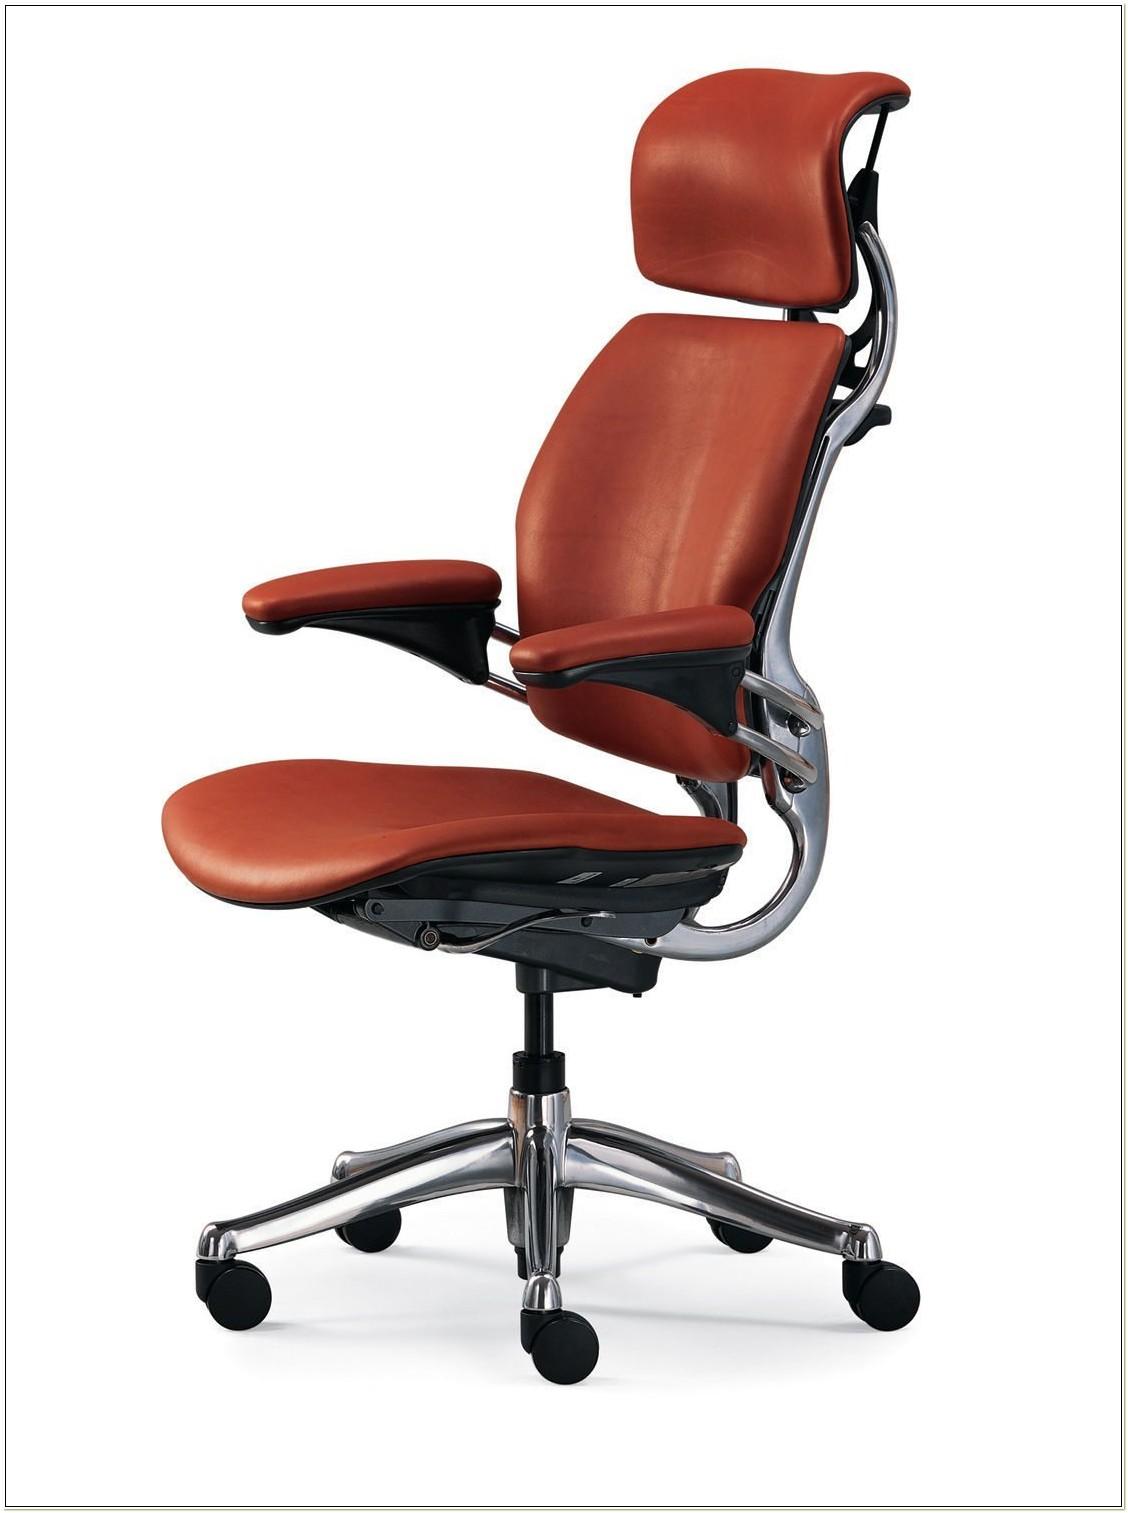 Inexpensive Ergonomic Desk Chair